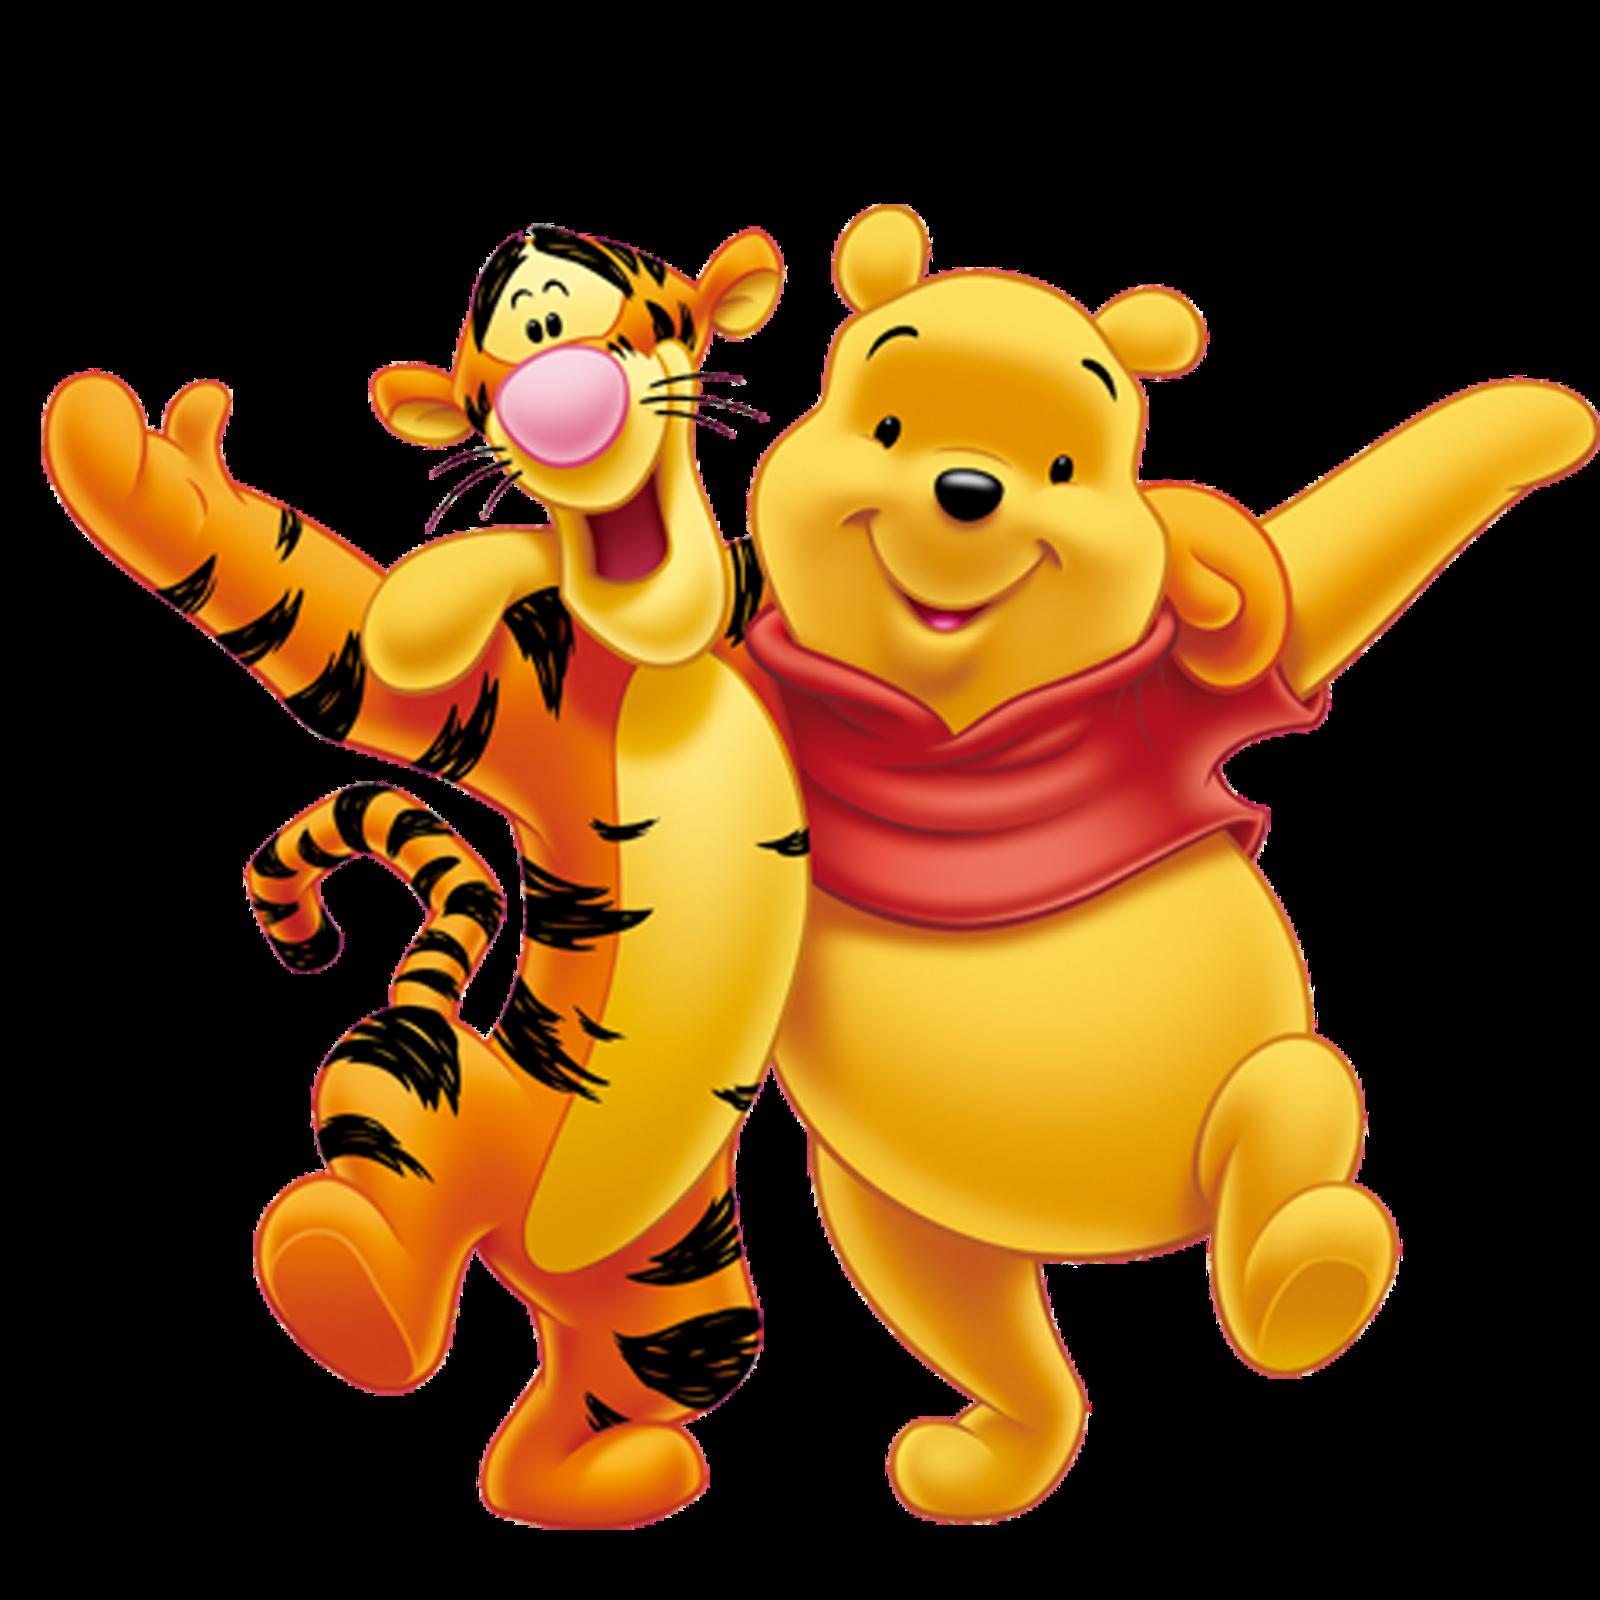 Imagenes de Winnie Pooh  Tiernas para Celular  Fondos【 IMAGENES